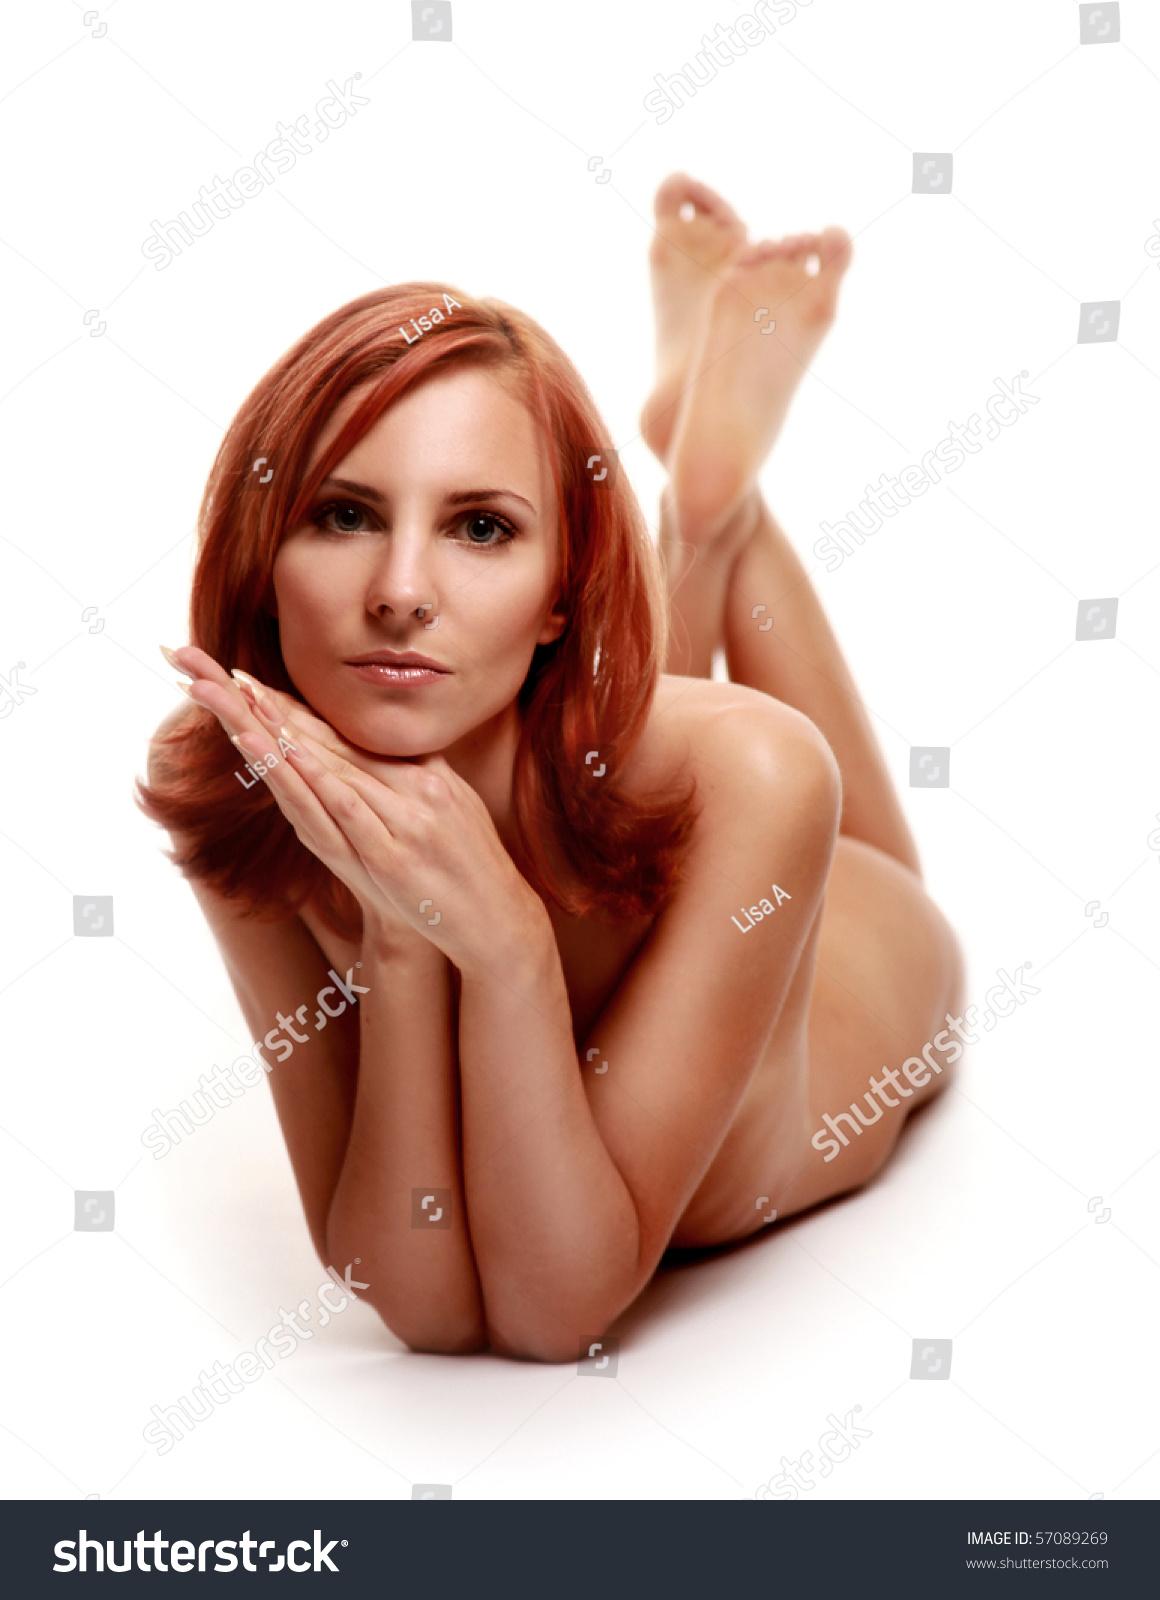 Happy Naked Dancer Stock Photo 39544075 : Shutterstock